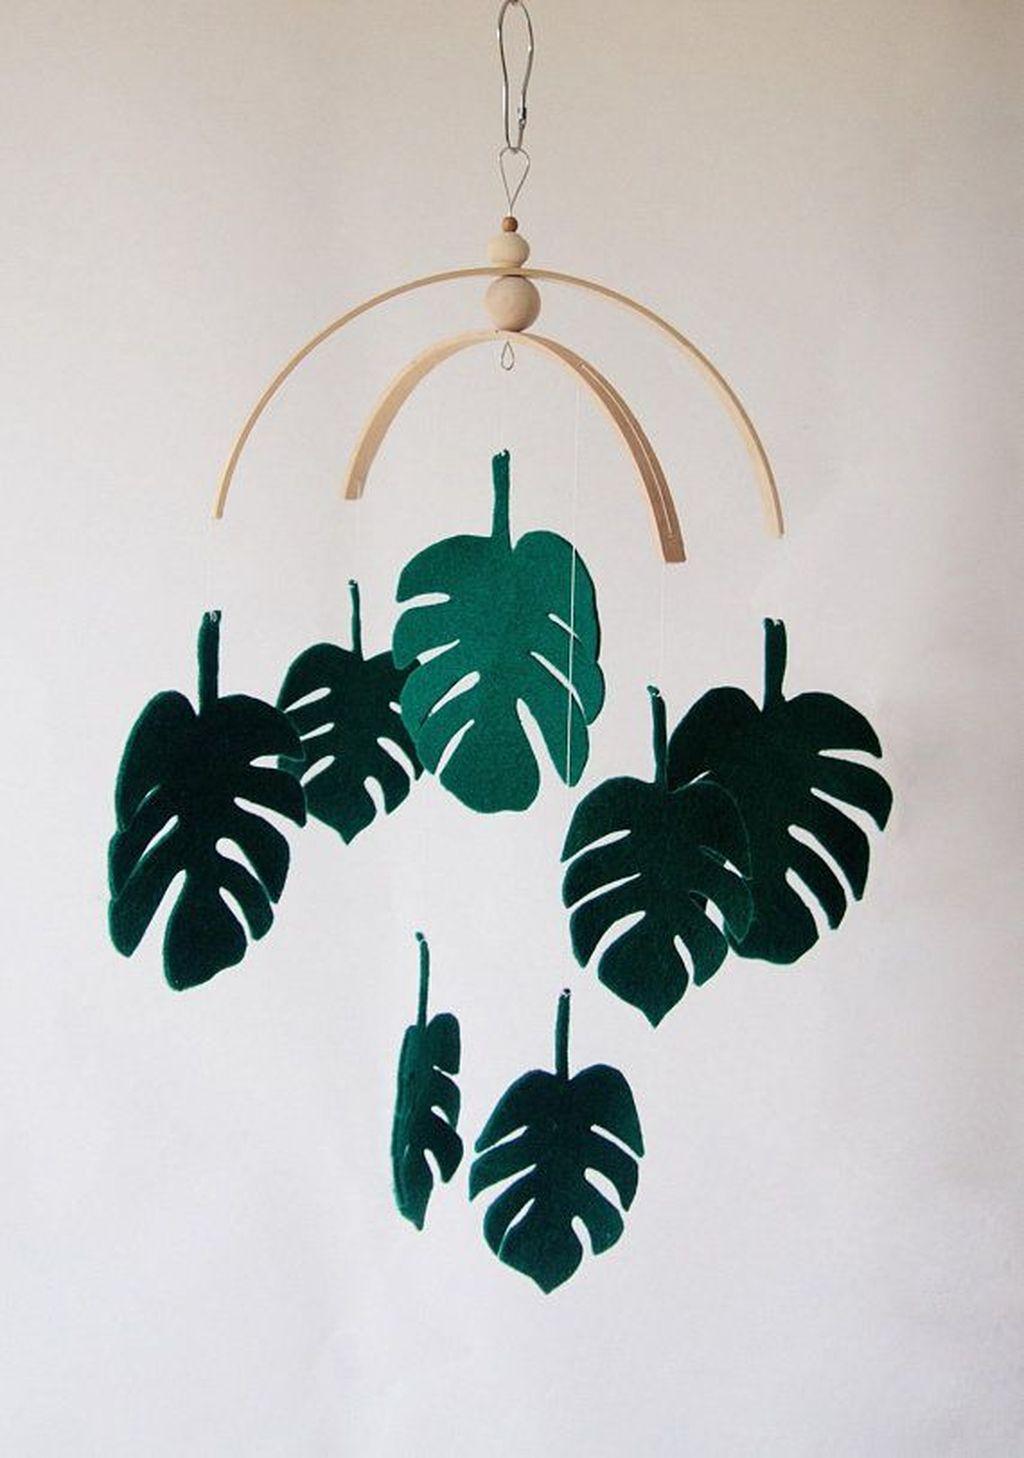 Splendid Tropical Leaf Decor Ideas For Home Design 02